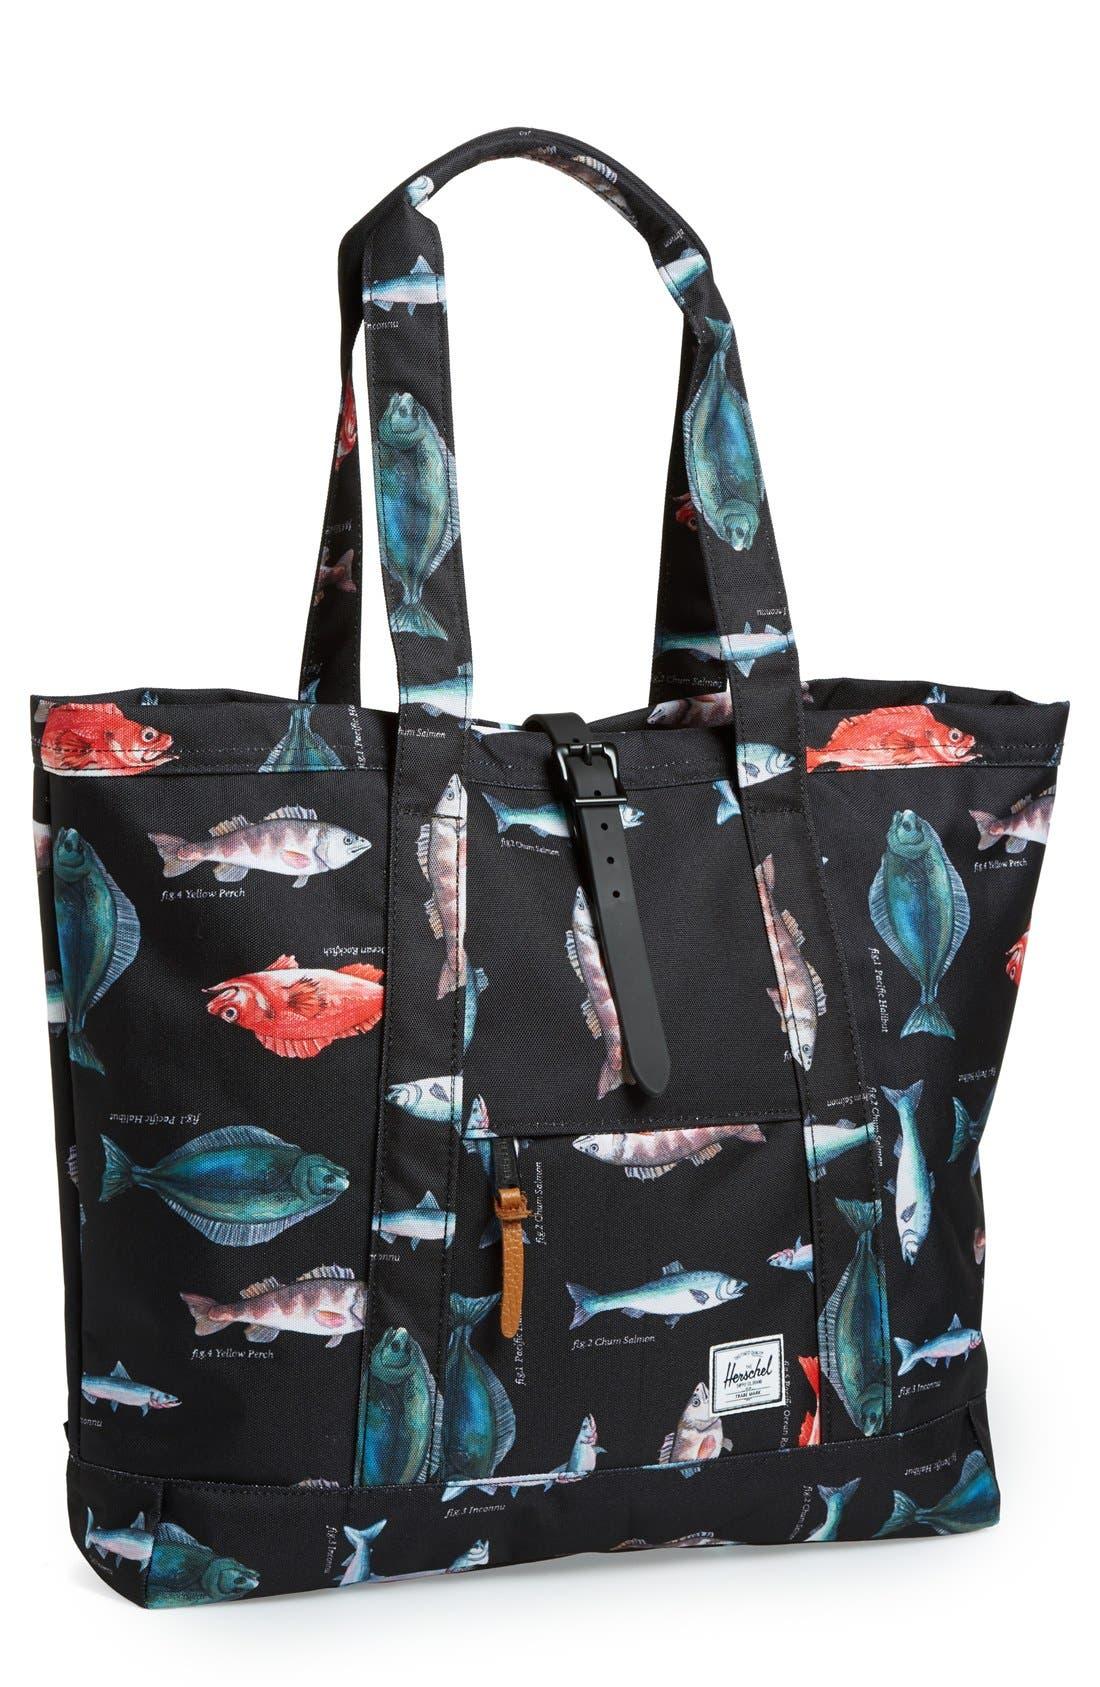 Alternate Image 1 Selected - Herschel Supply Co. 'Market XL' Tote Bag